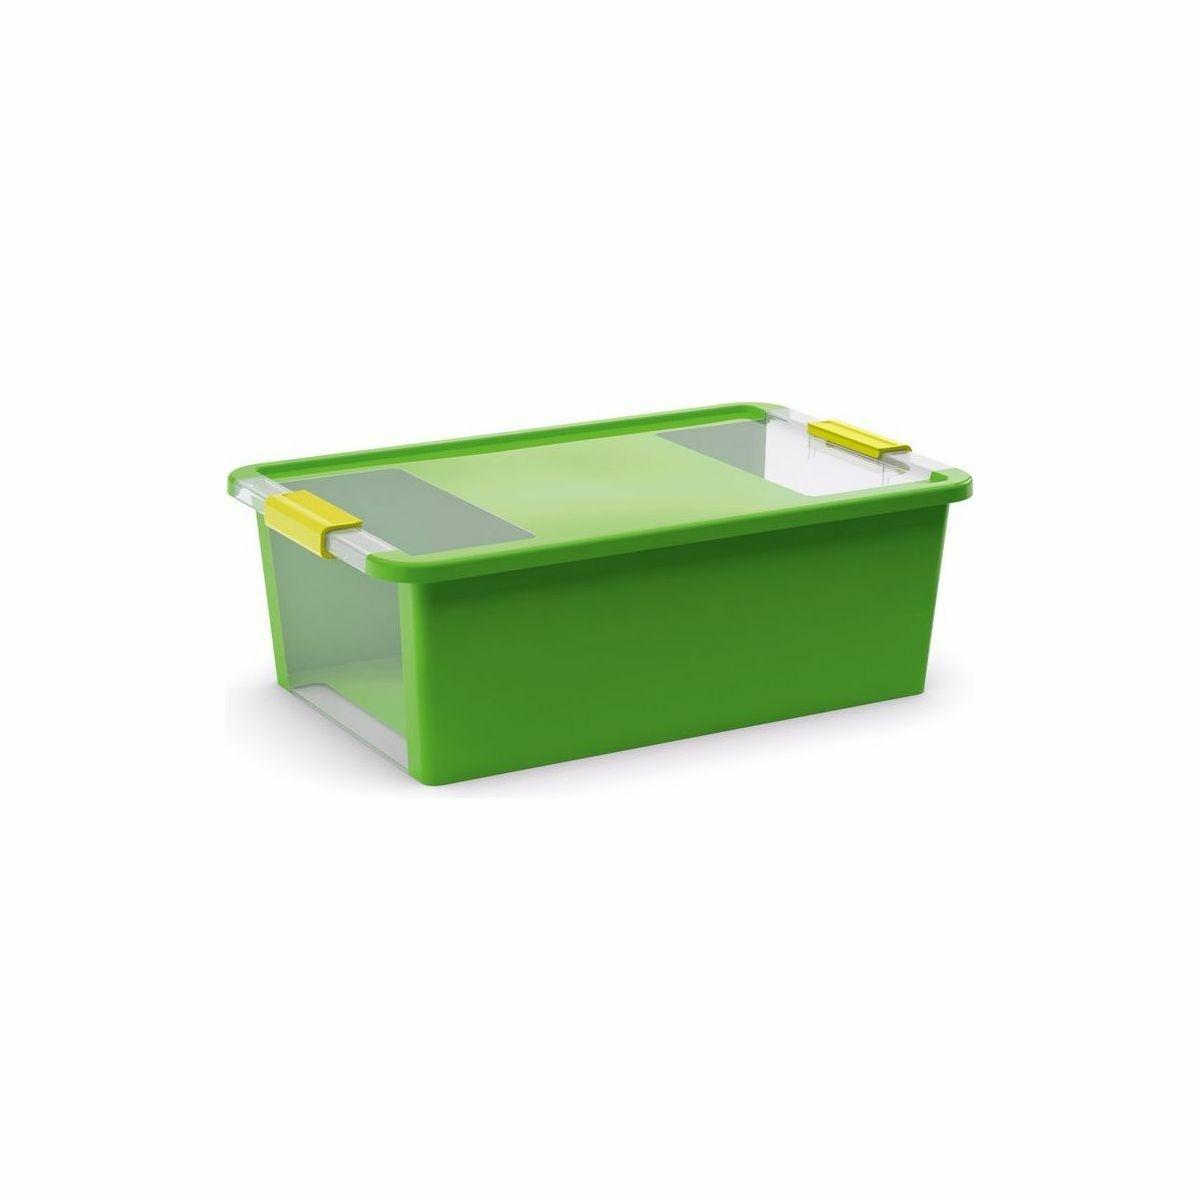 KIS Bi Box M - zelený 26l 008453LGN